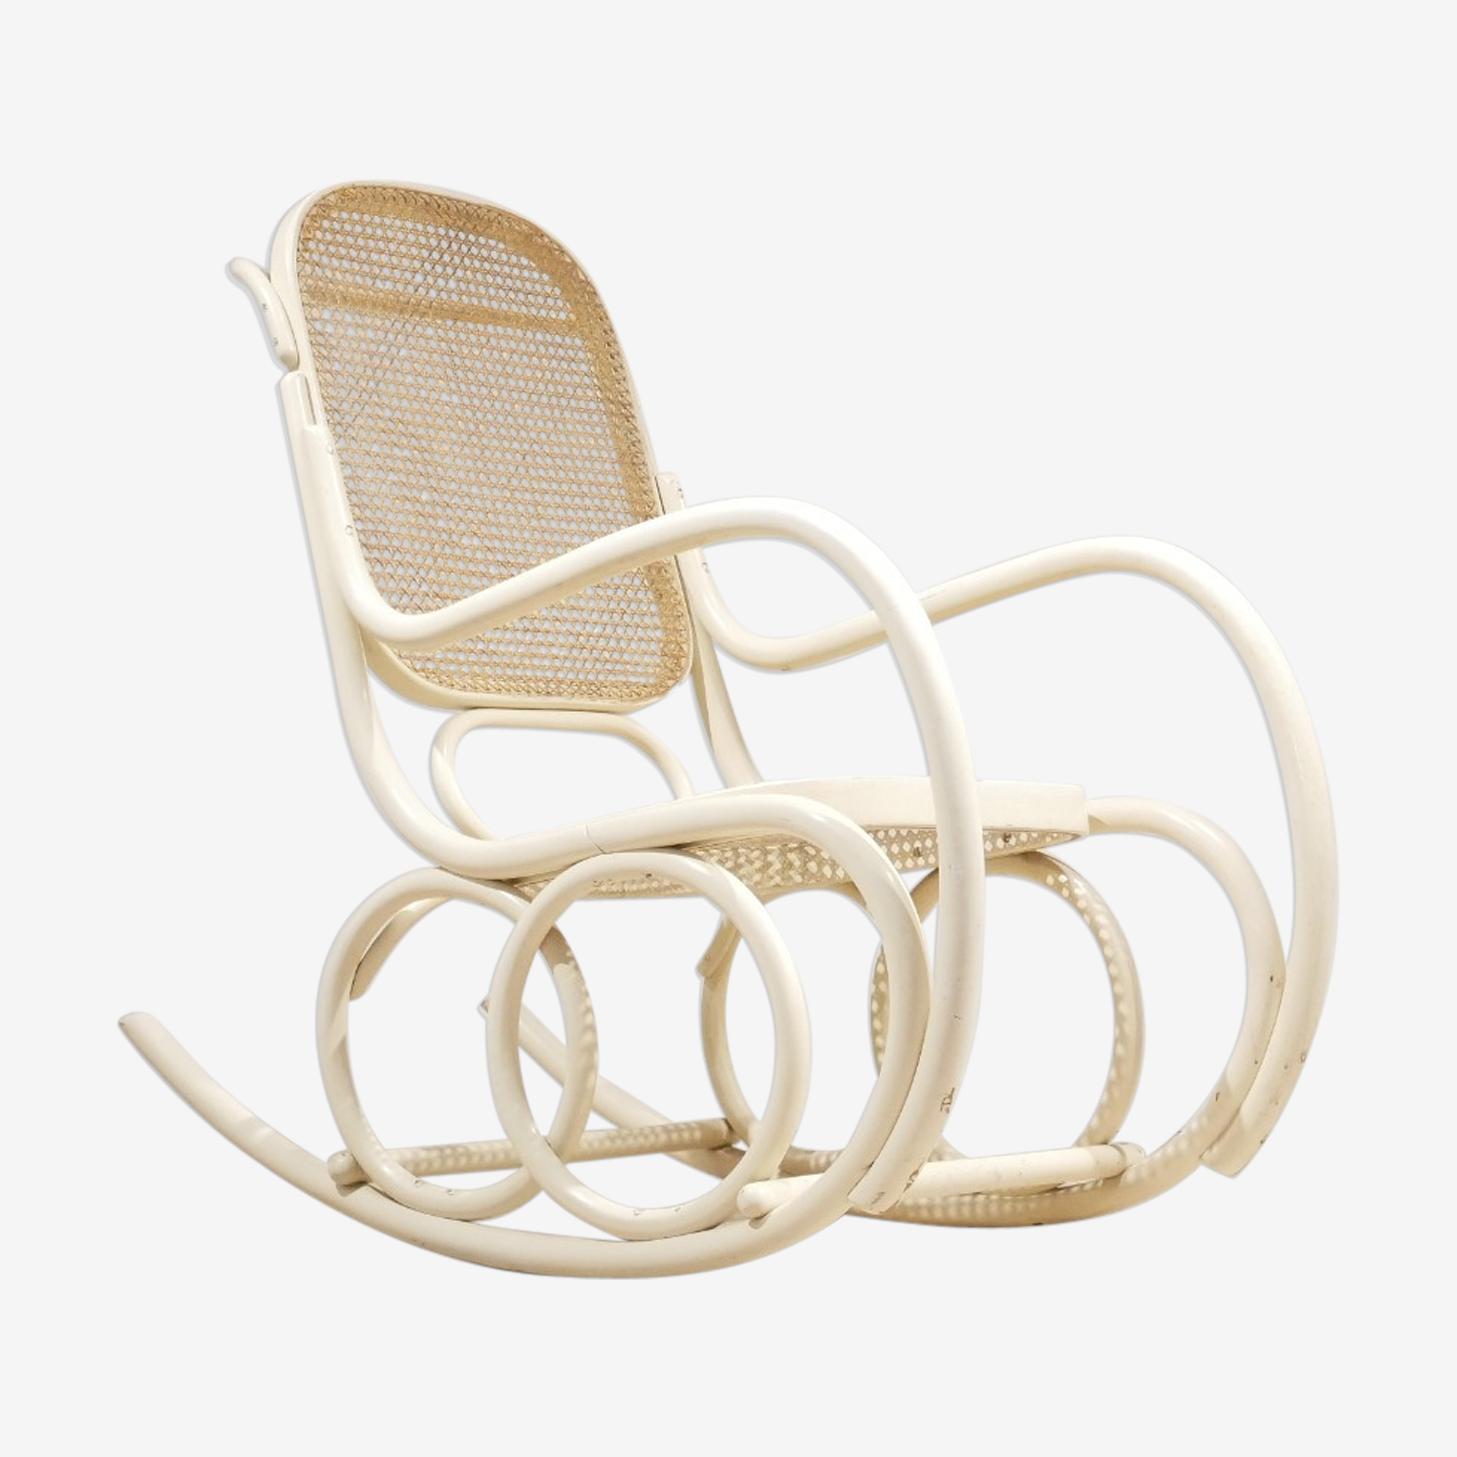 Ancien rocking chair en bois courbé blanc